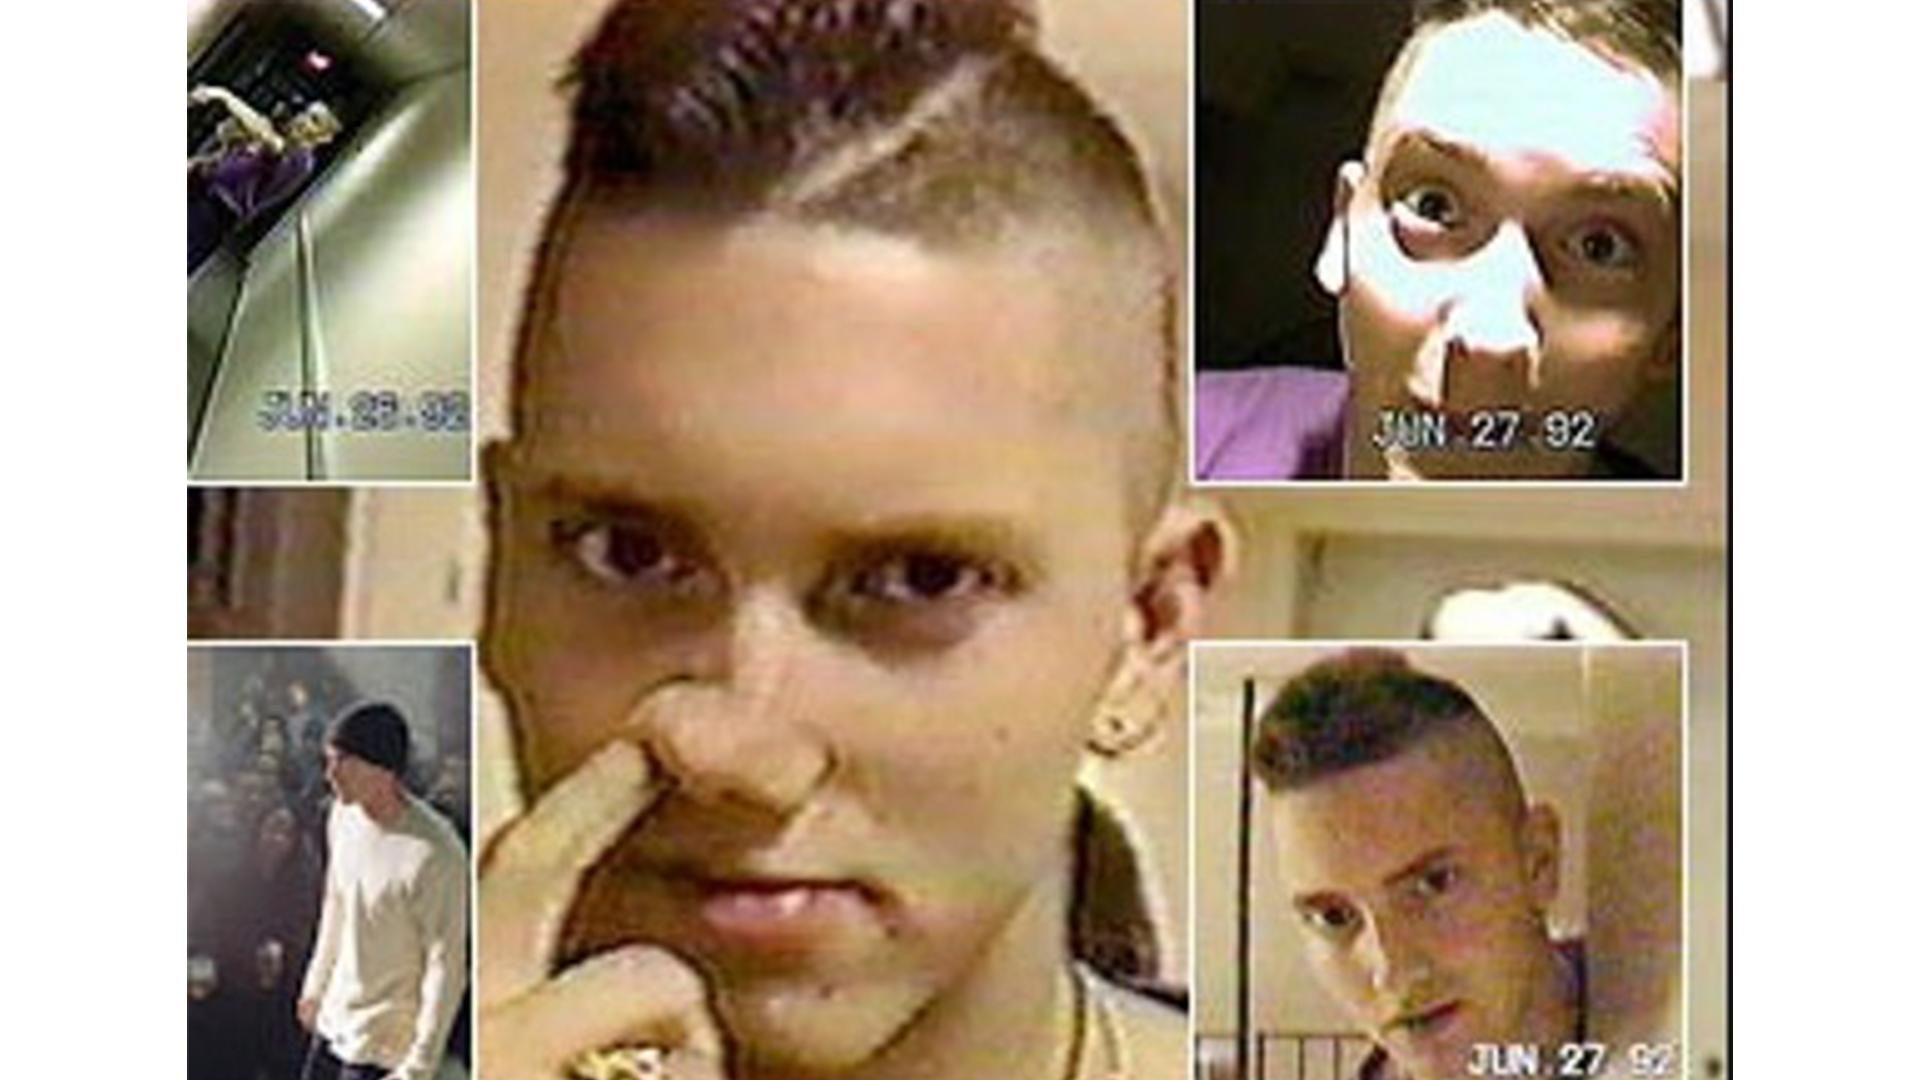 Архивные кадры: Эминем из 1992